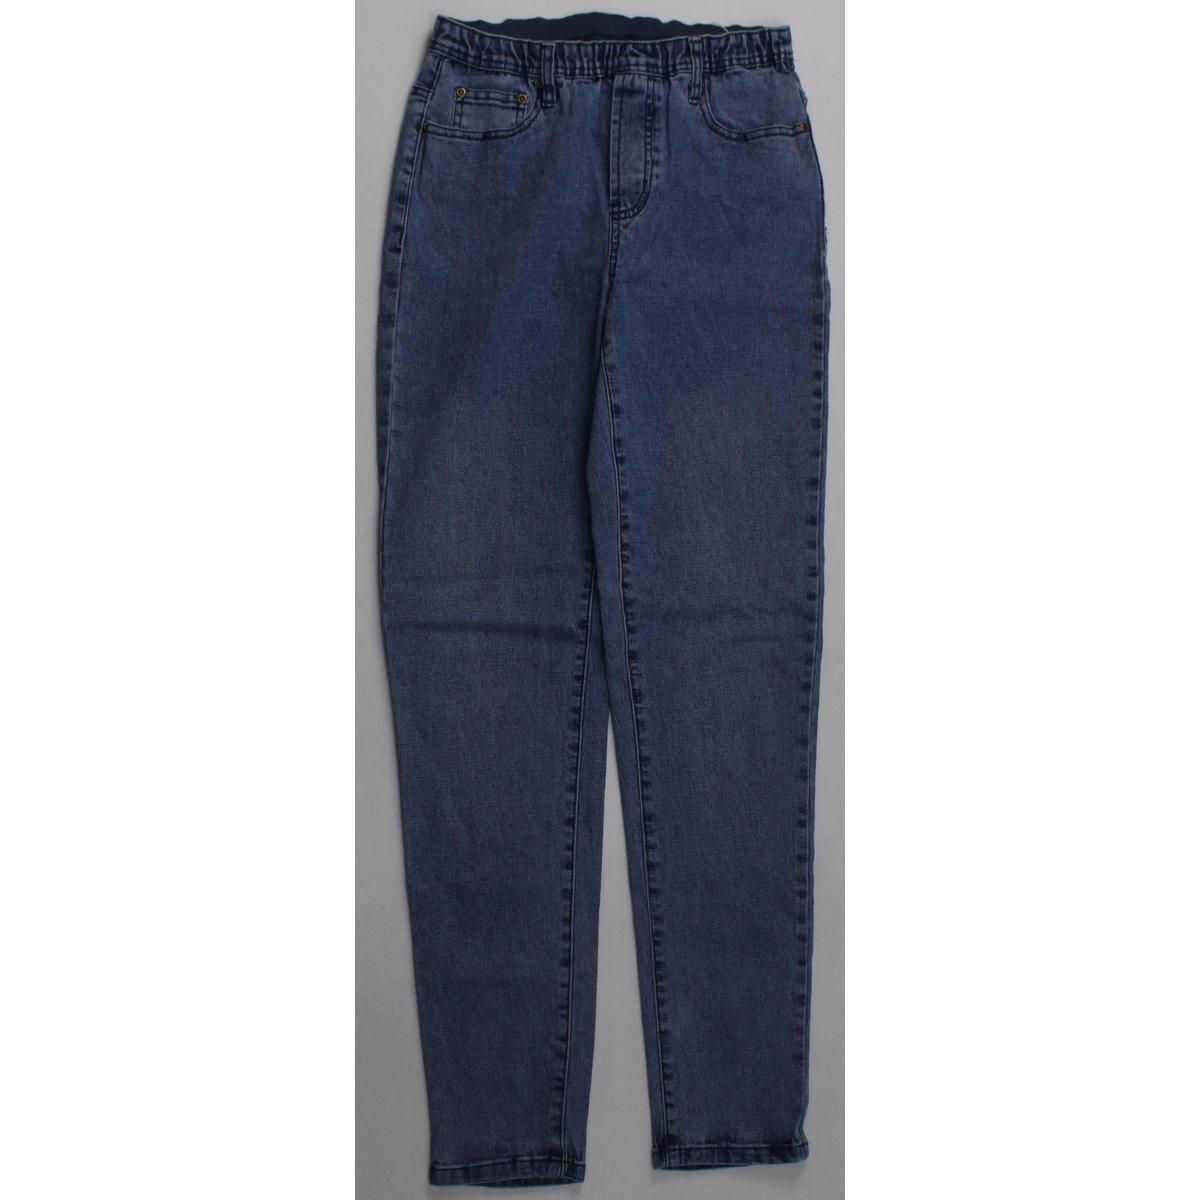 diane gilman womens xs jeans tapered straight leg tall medium wash blue denim ebay. Black Bedroom Furniture Sets. Home Design Ideas